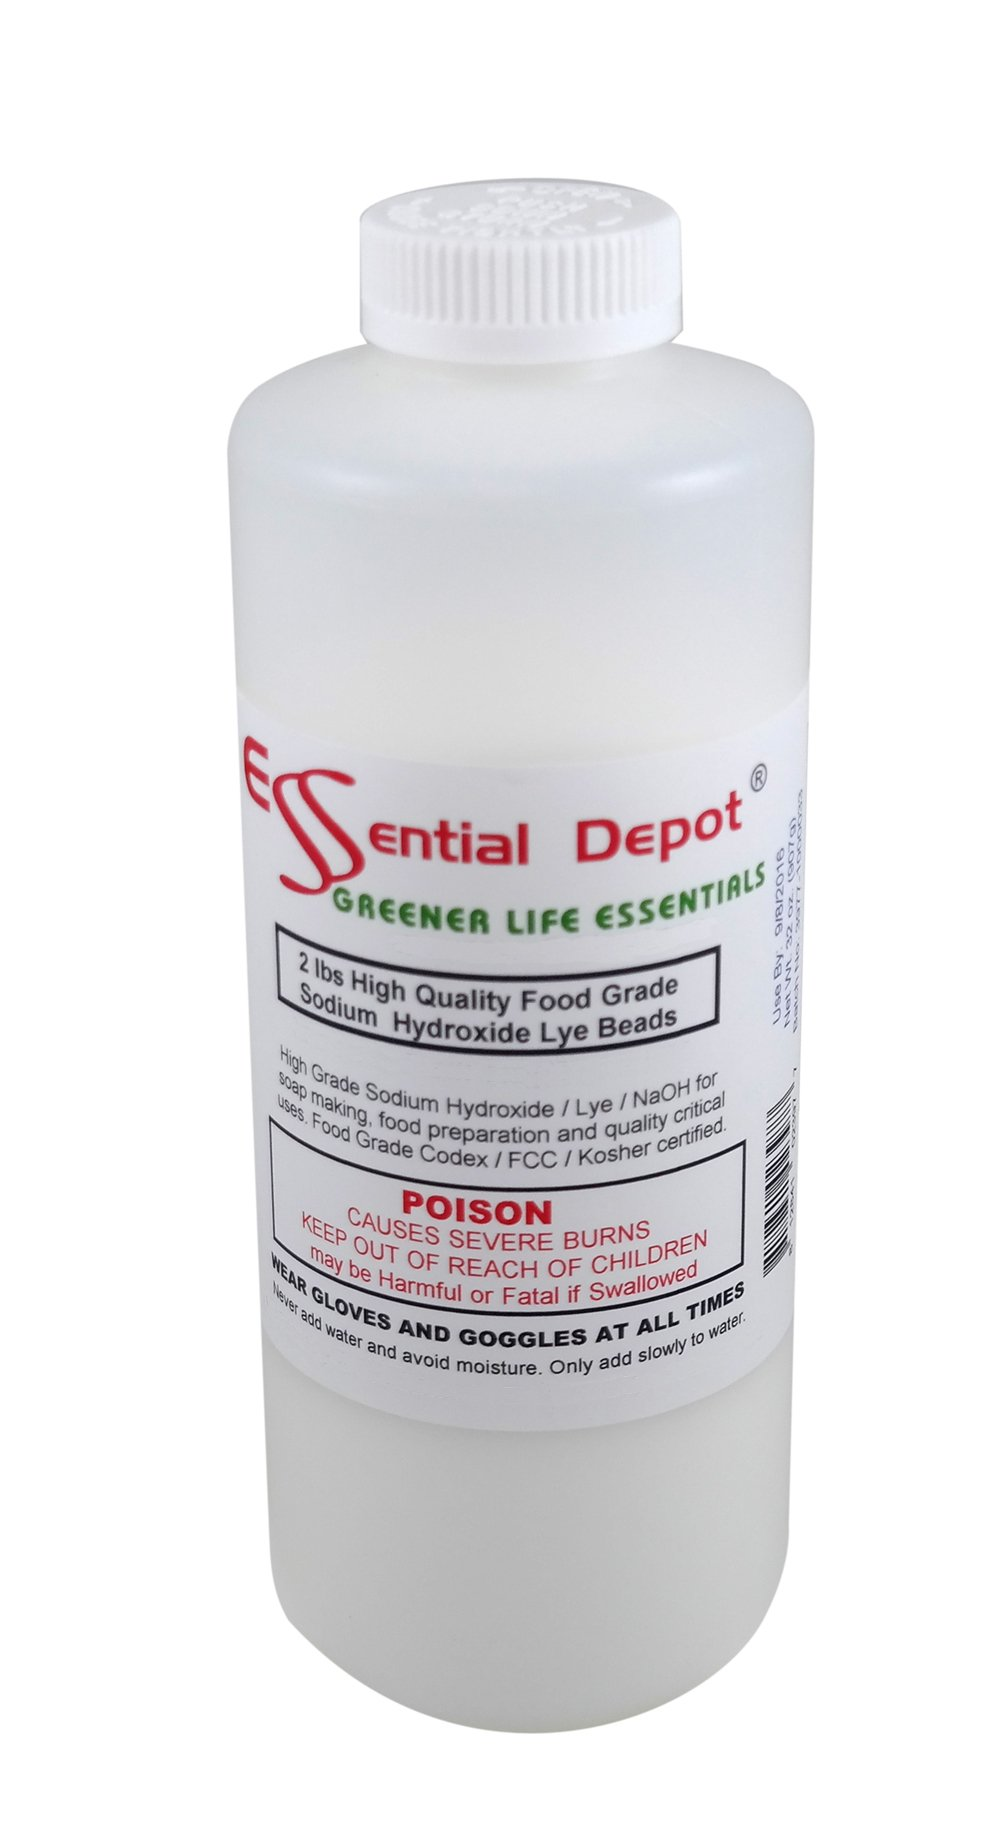 Food Grade Sodium Hydroxide Lye Micro Beads, 2 Lbs. by Essential Depot